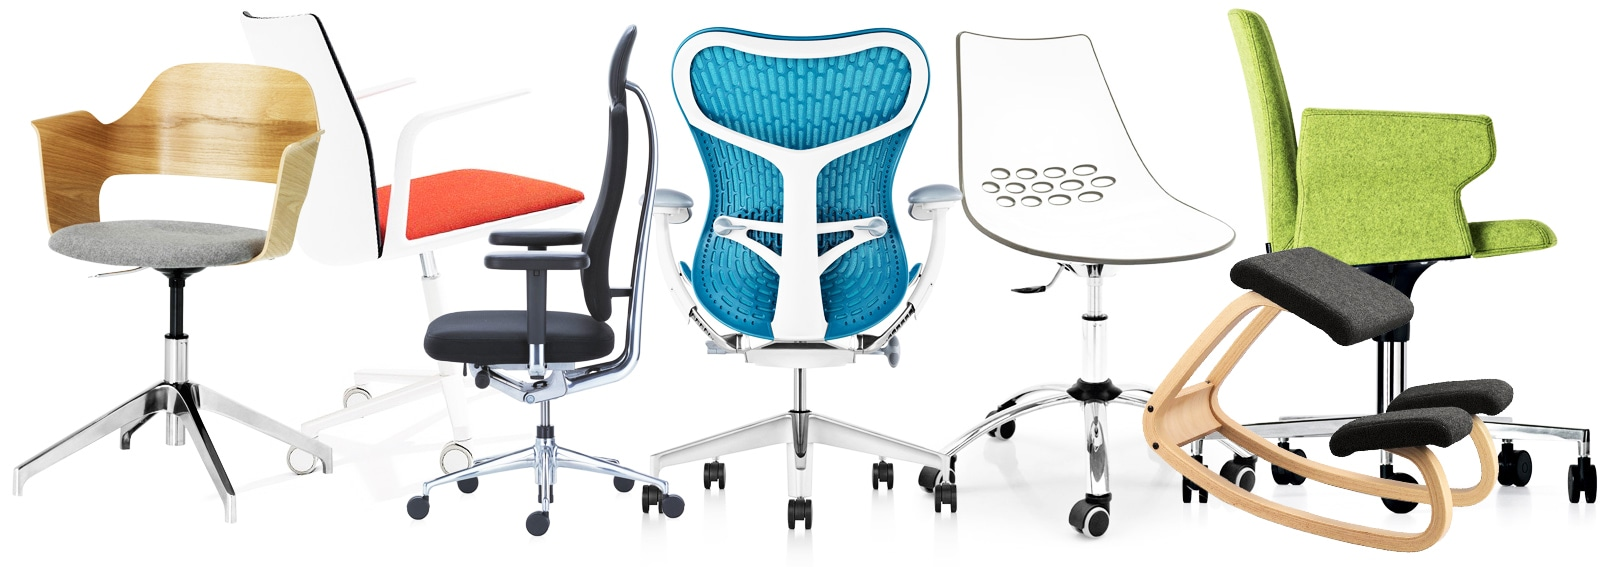 cover-10-sedie-comode-ufficio-desktop